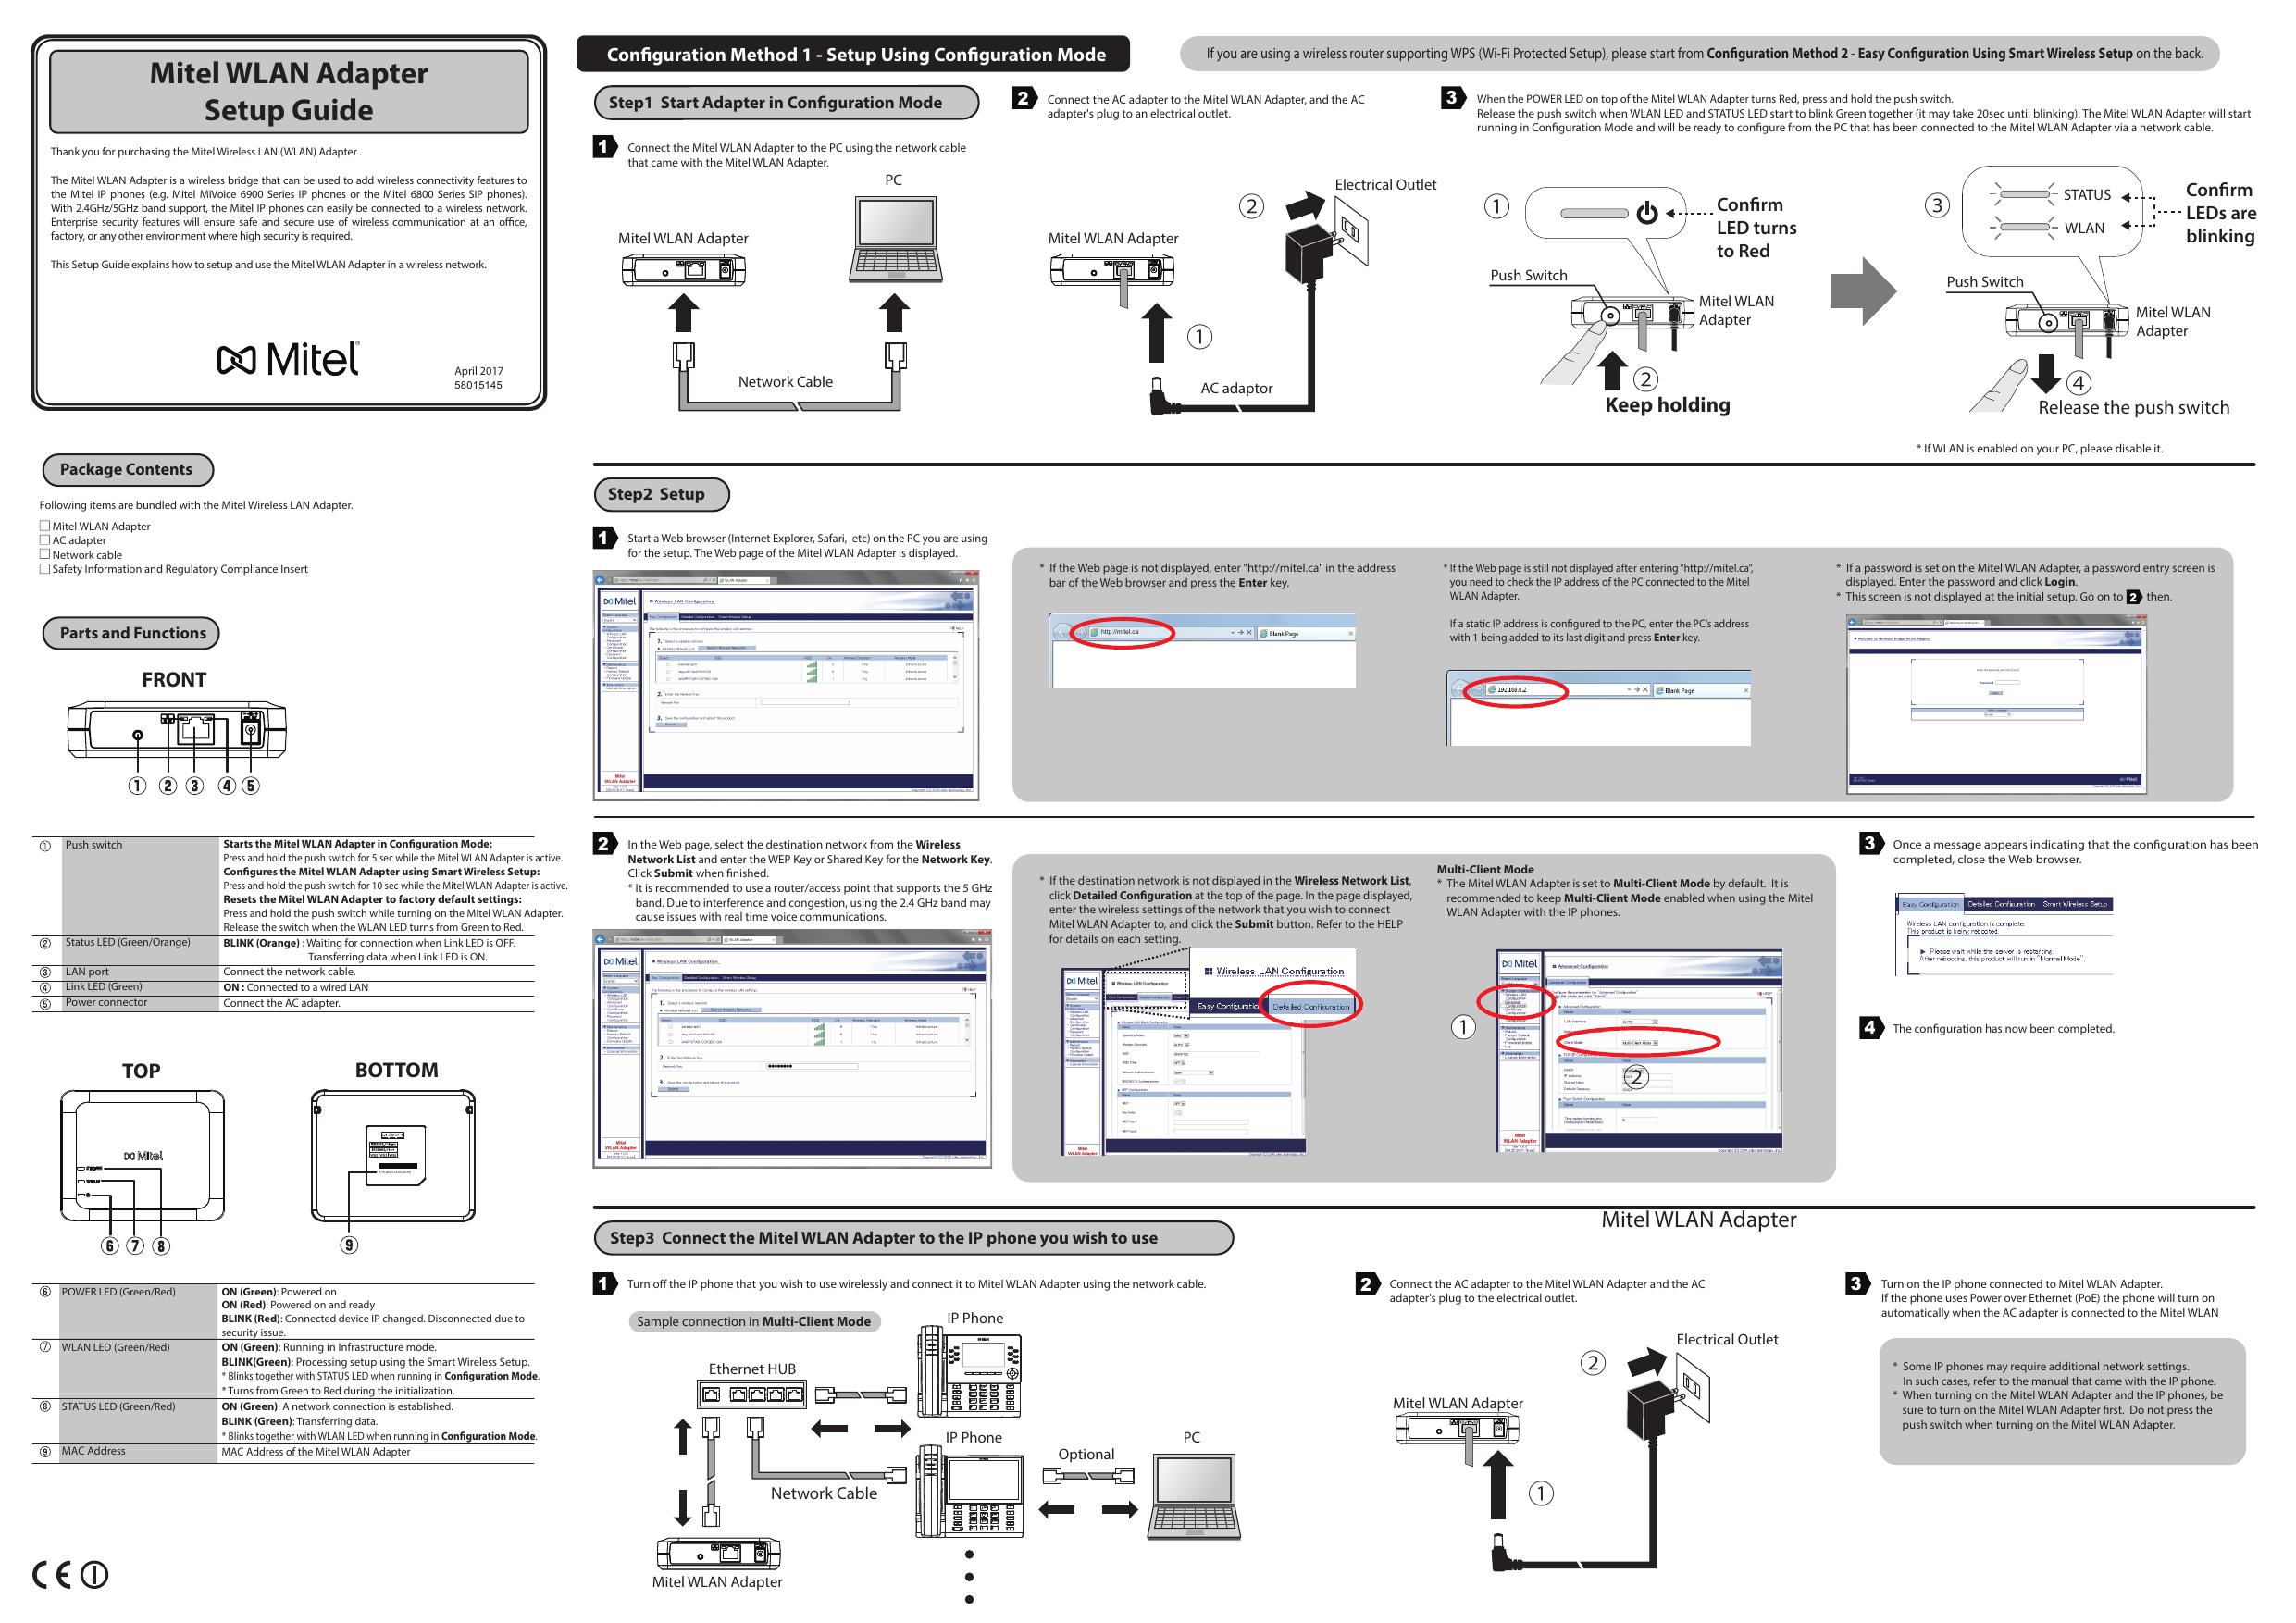 Mitel WLAN Adapter Setup Guide | manualzz com